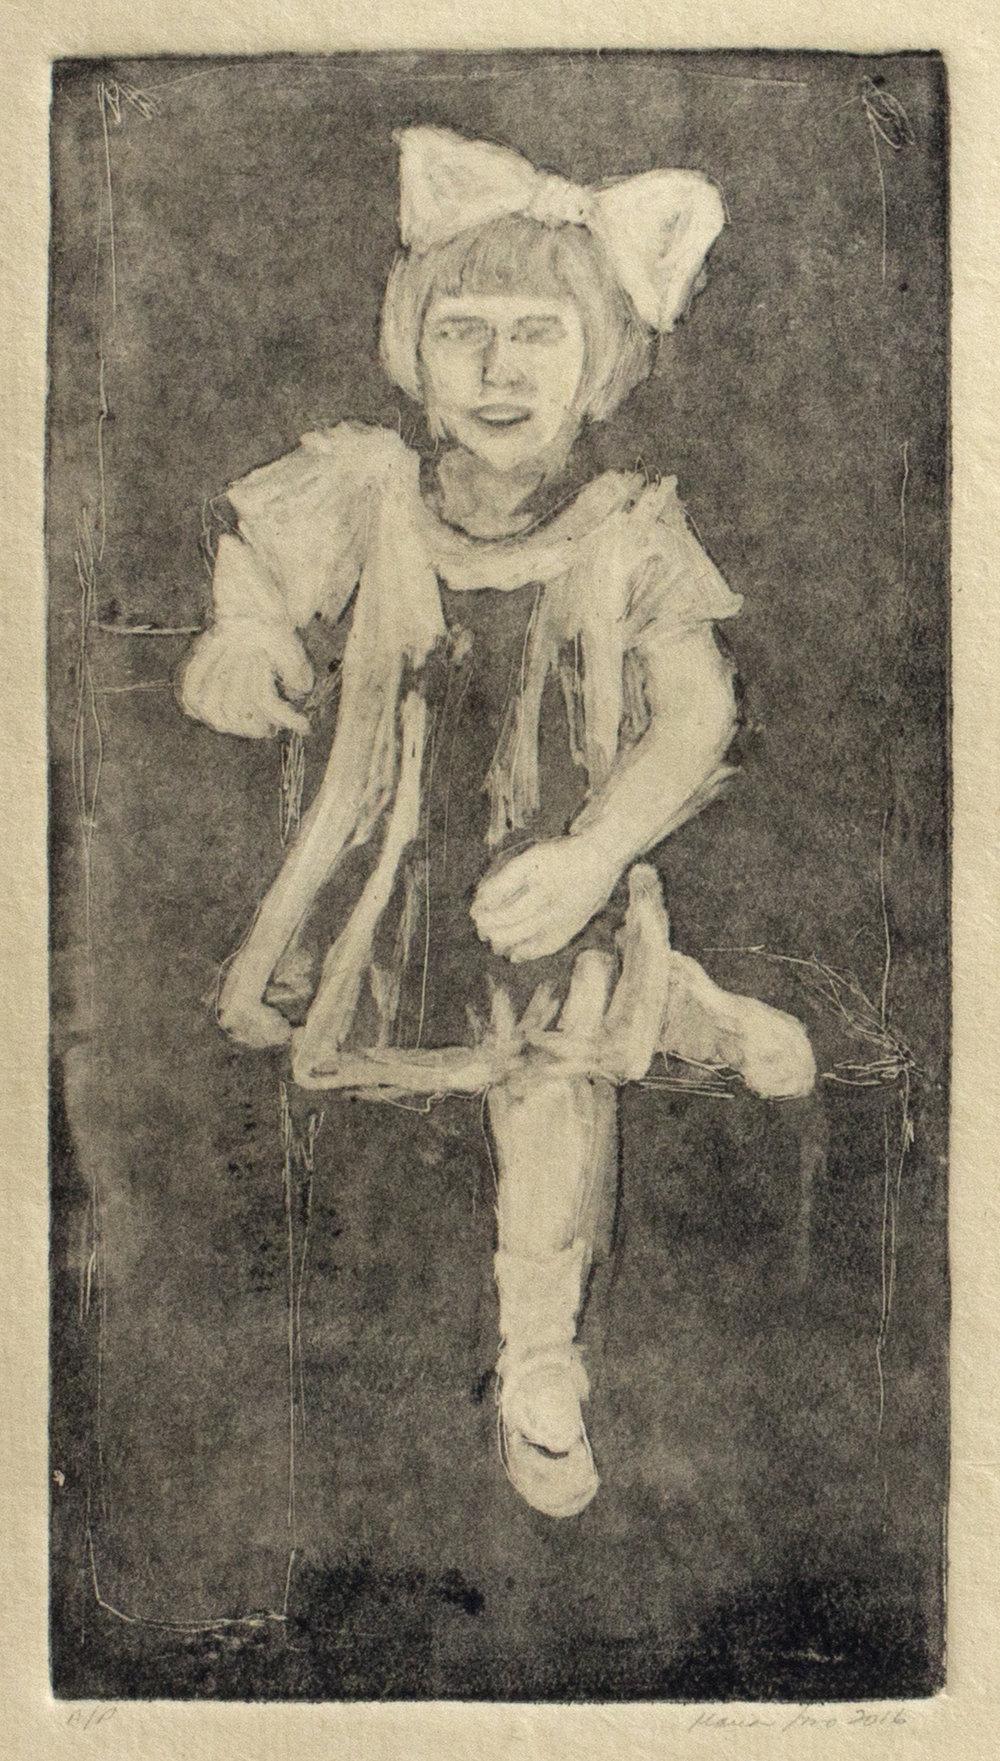 Tia Olga with Bow (Ghost Print on Sepia Paper), 2016